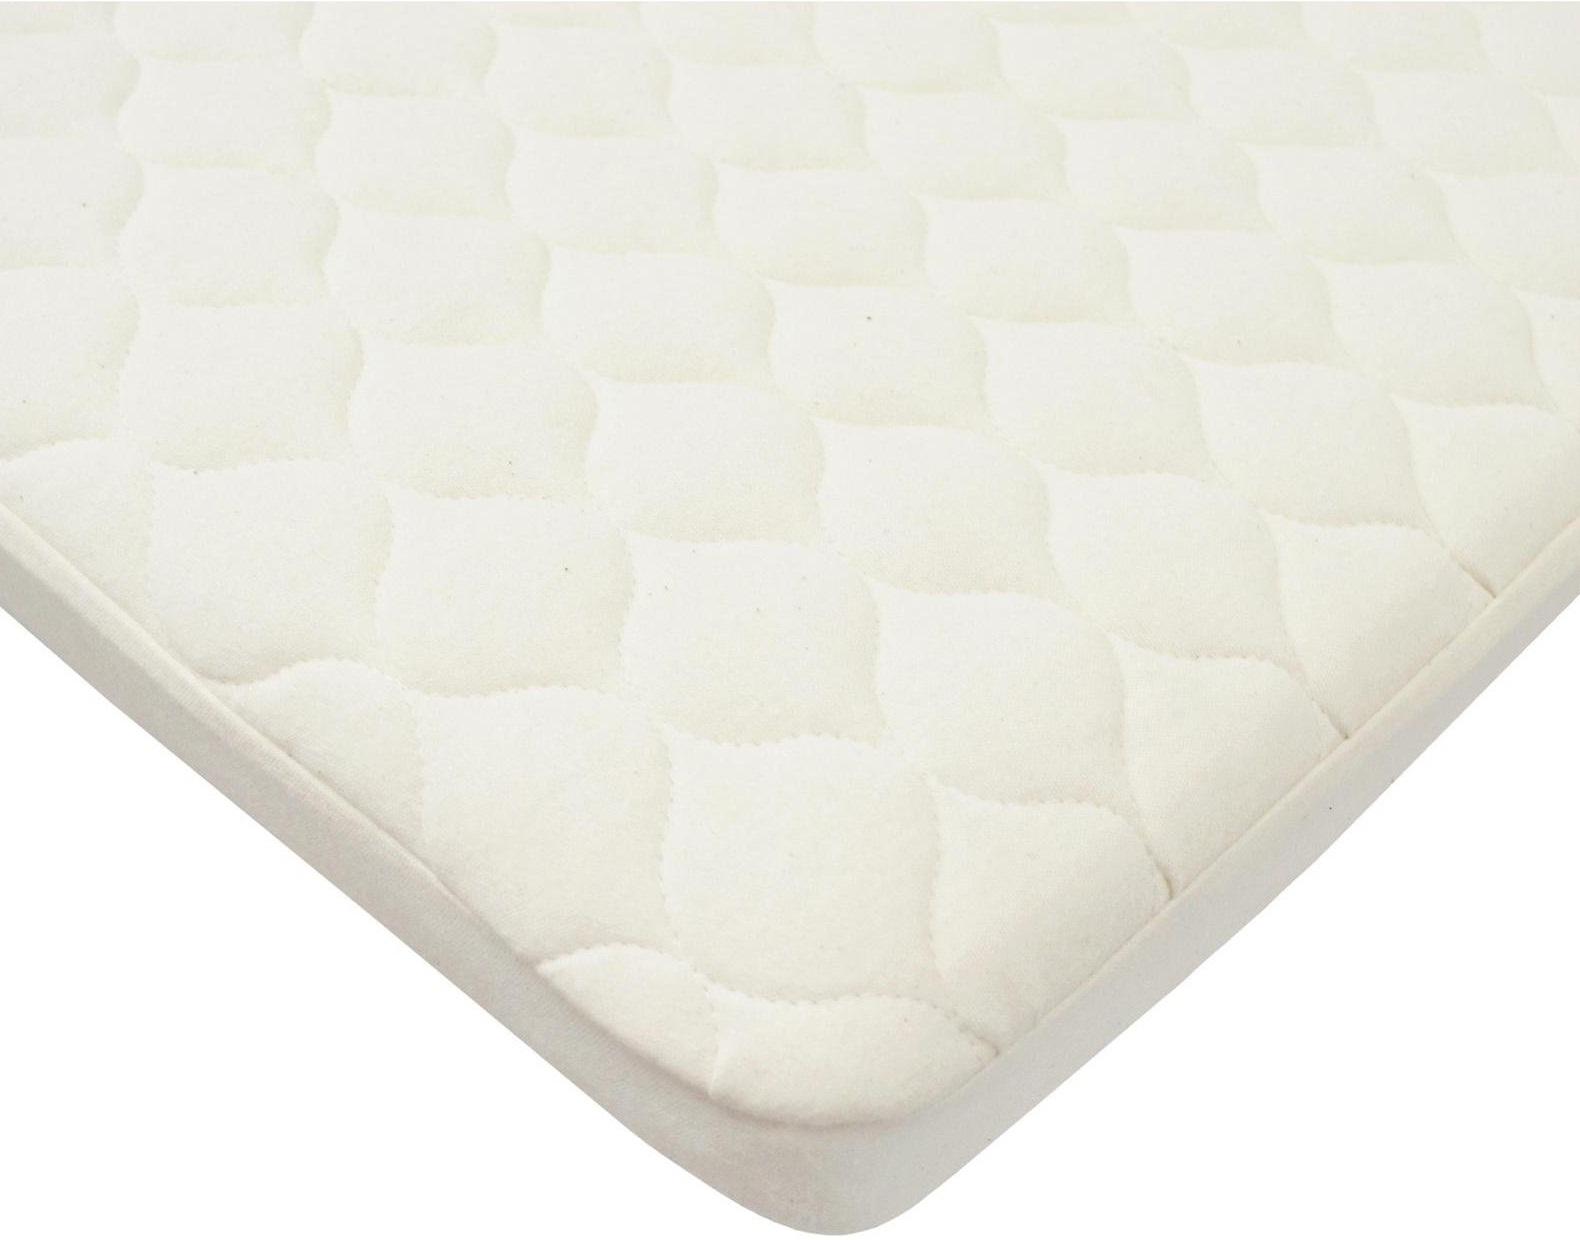 american baby company organic waterproof bassinet mattress pad